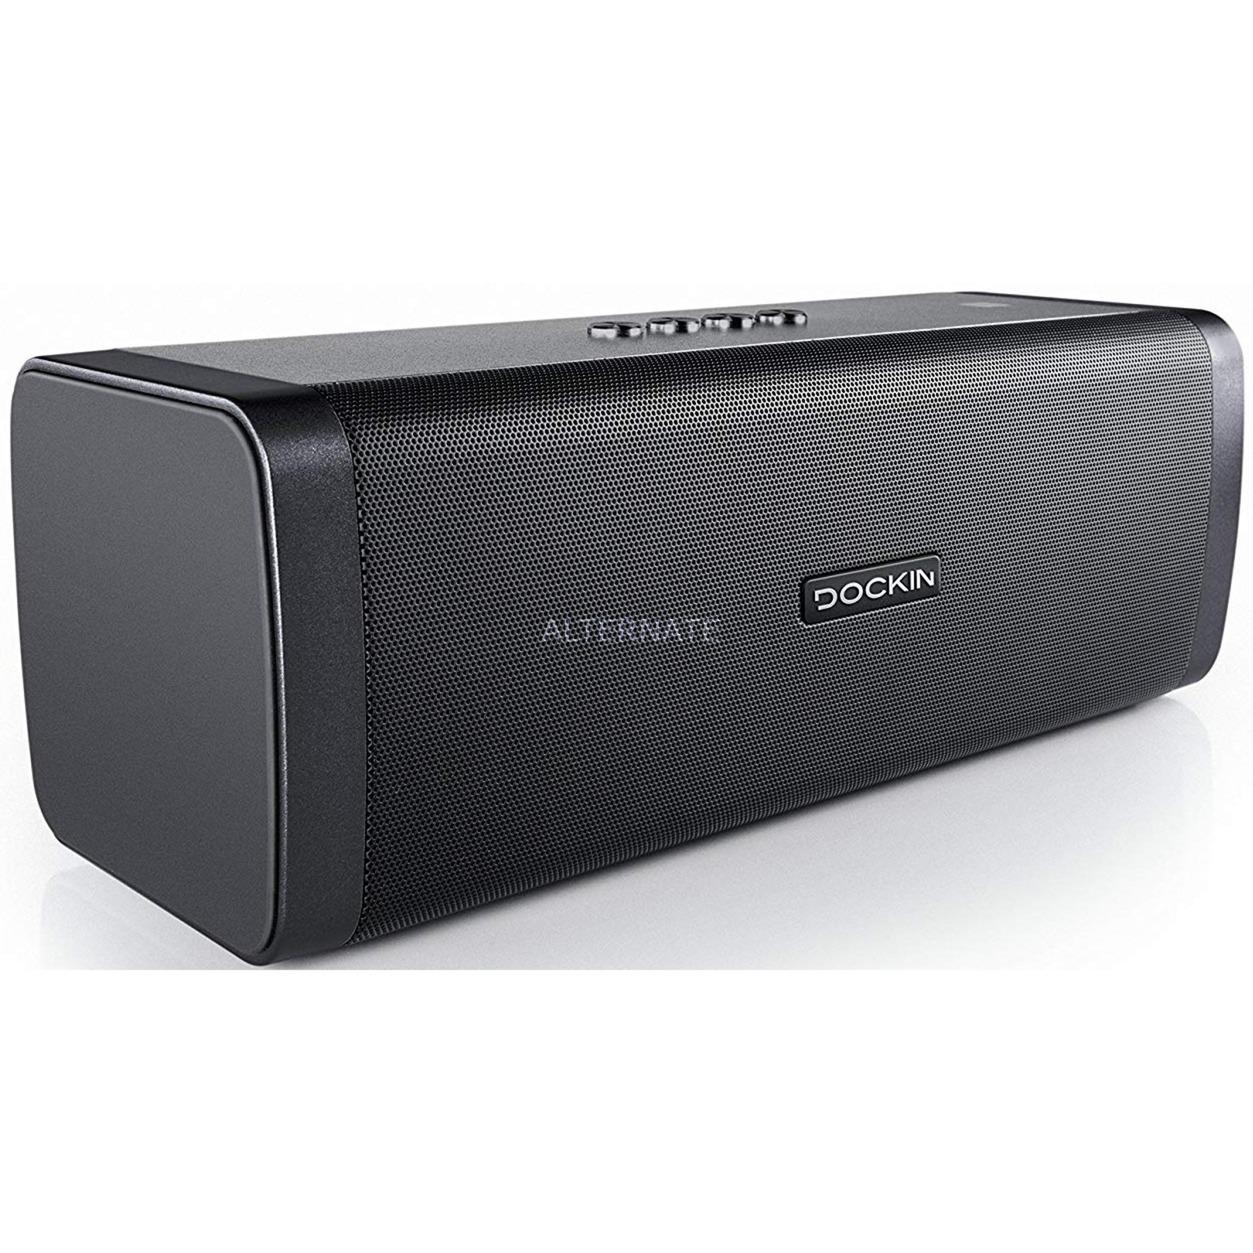 D Fine + 50 W Altavoz portátil estéreo Negro